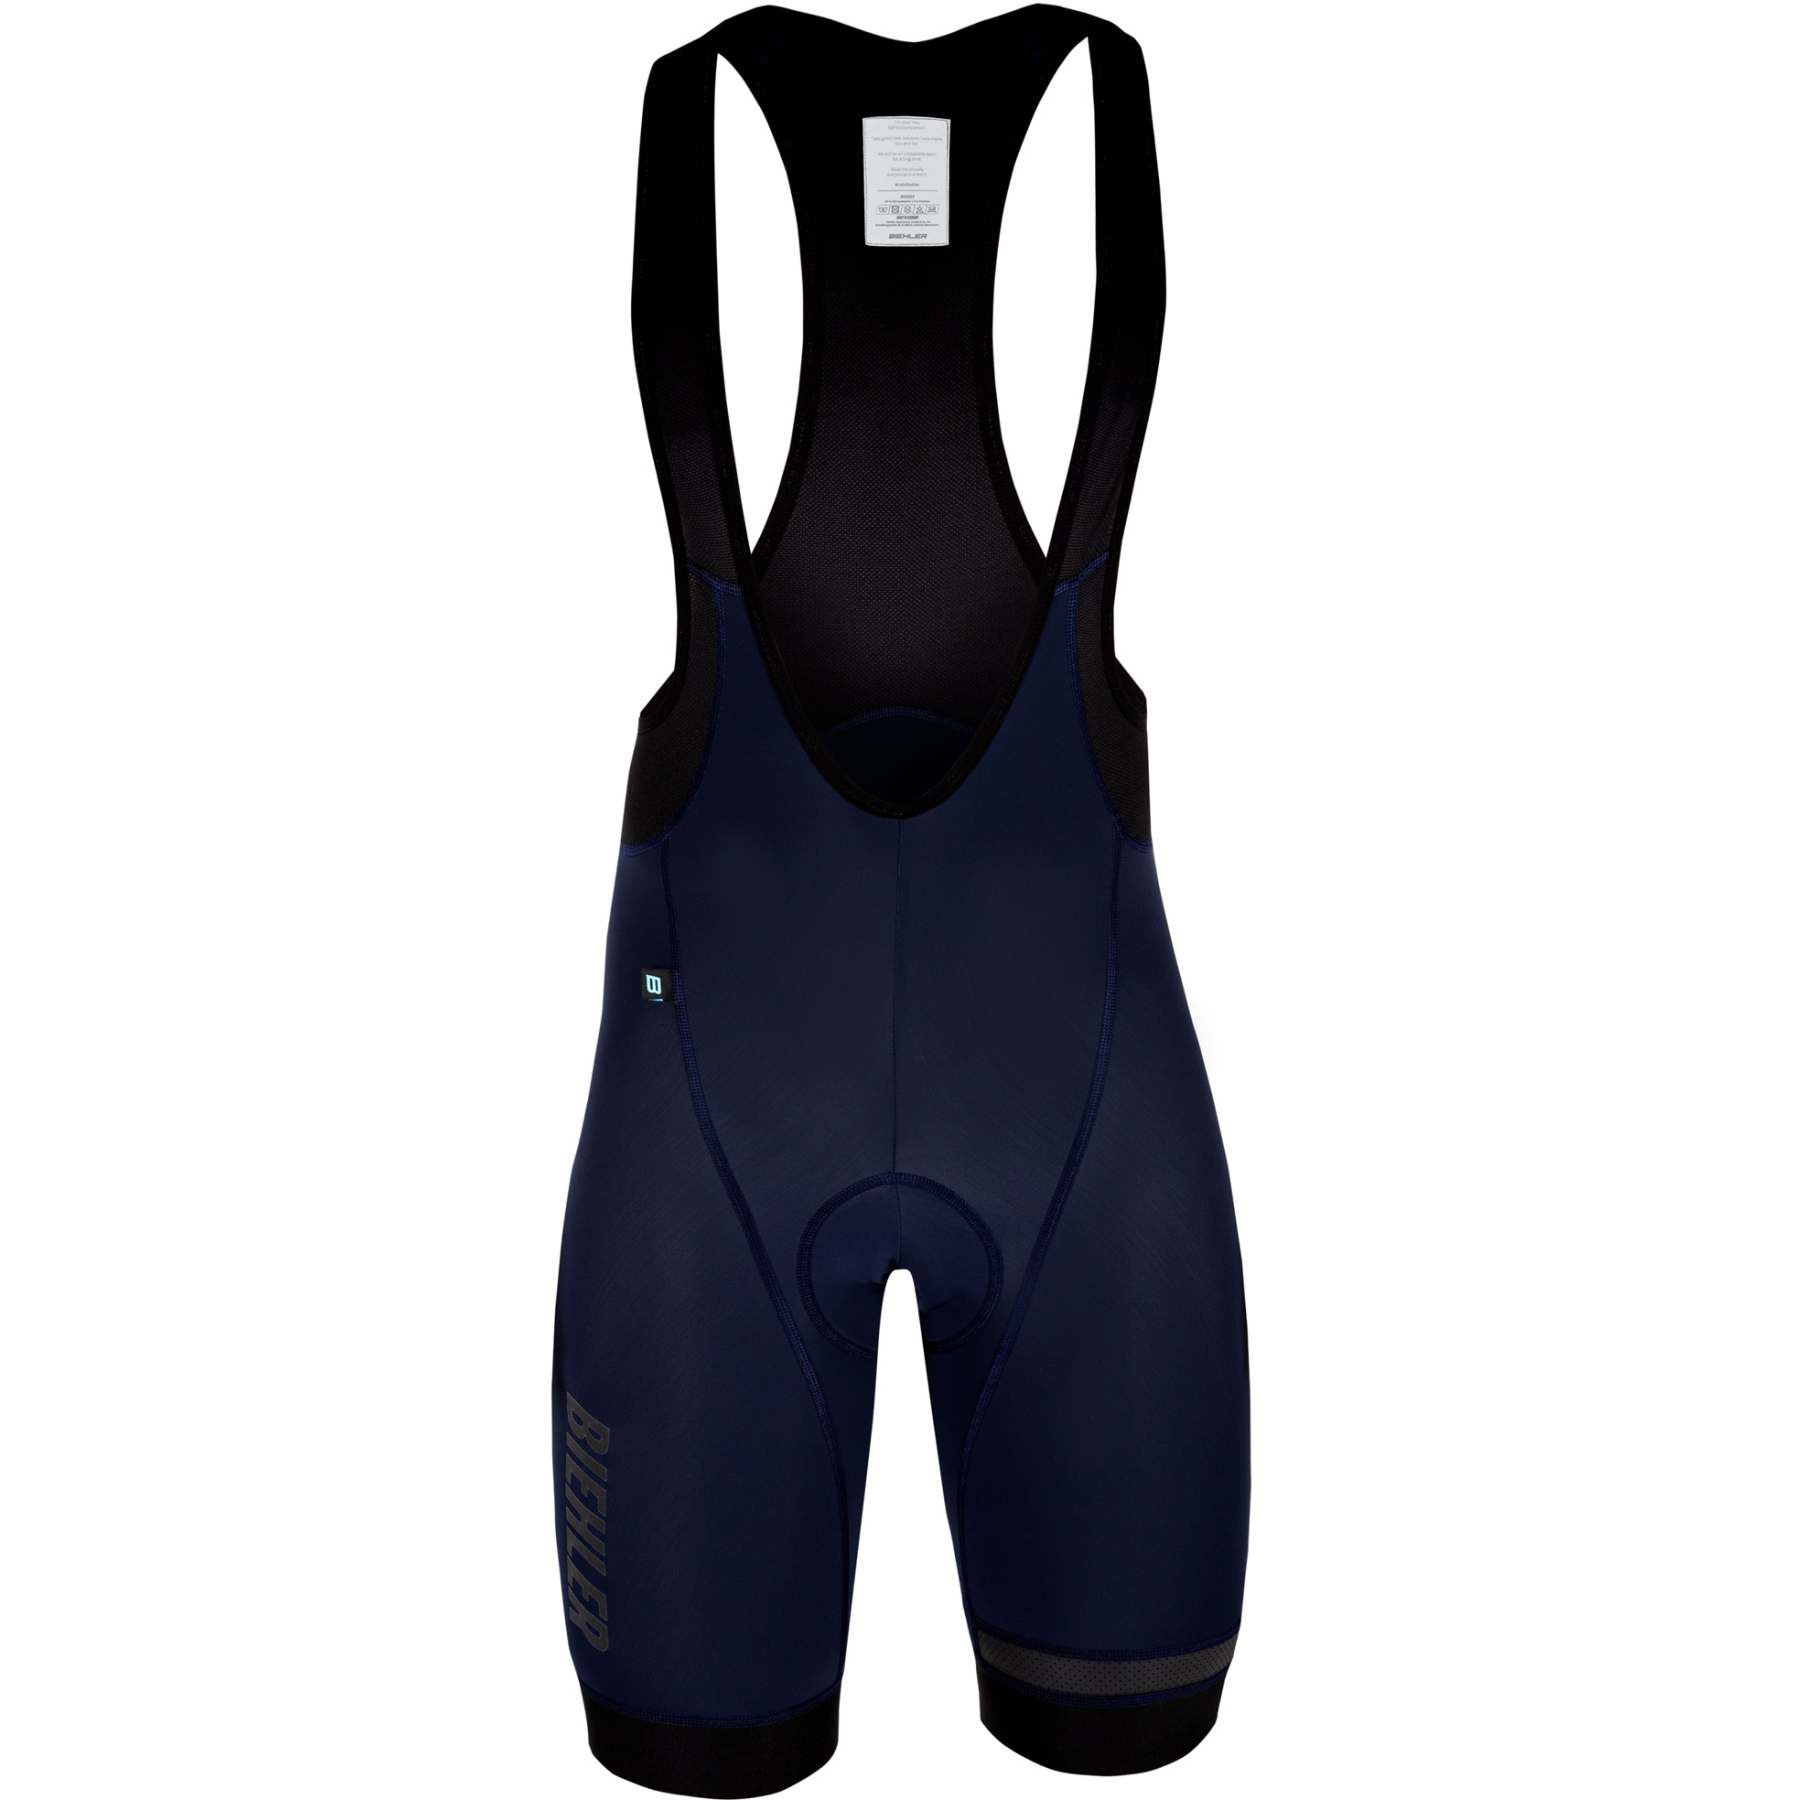 Biehler Neo Classic Signature³ Bib Shorts - night blue